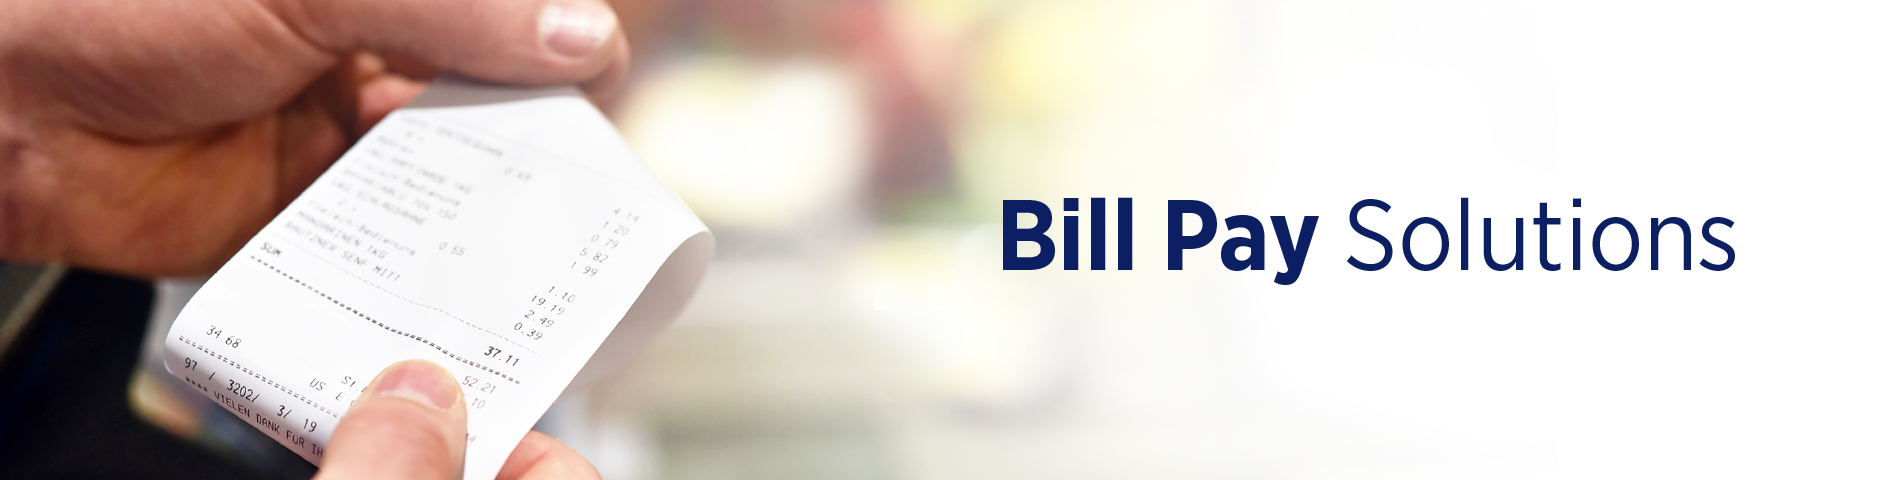 Utility Bill Payment Kiosks